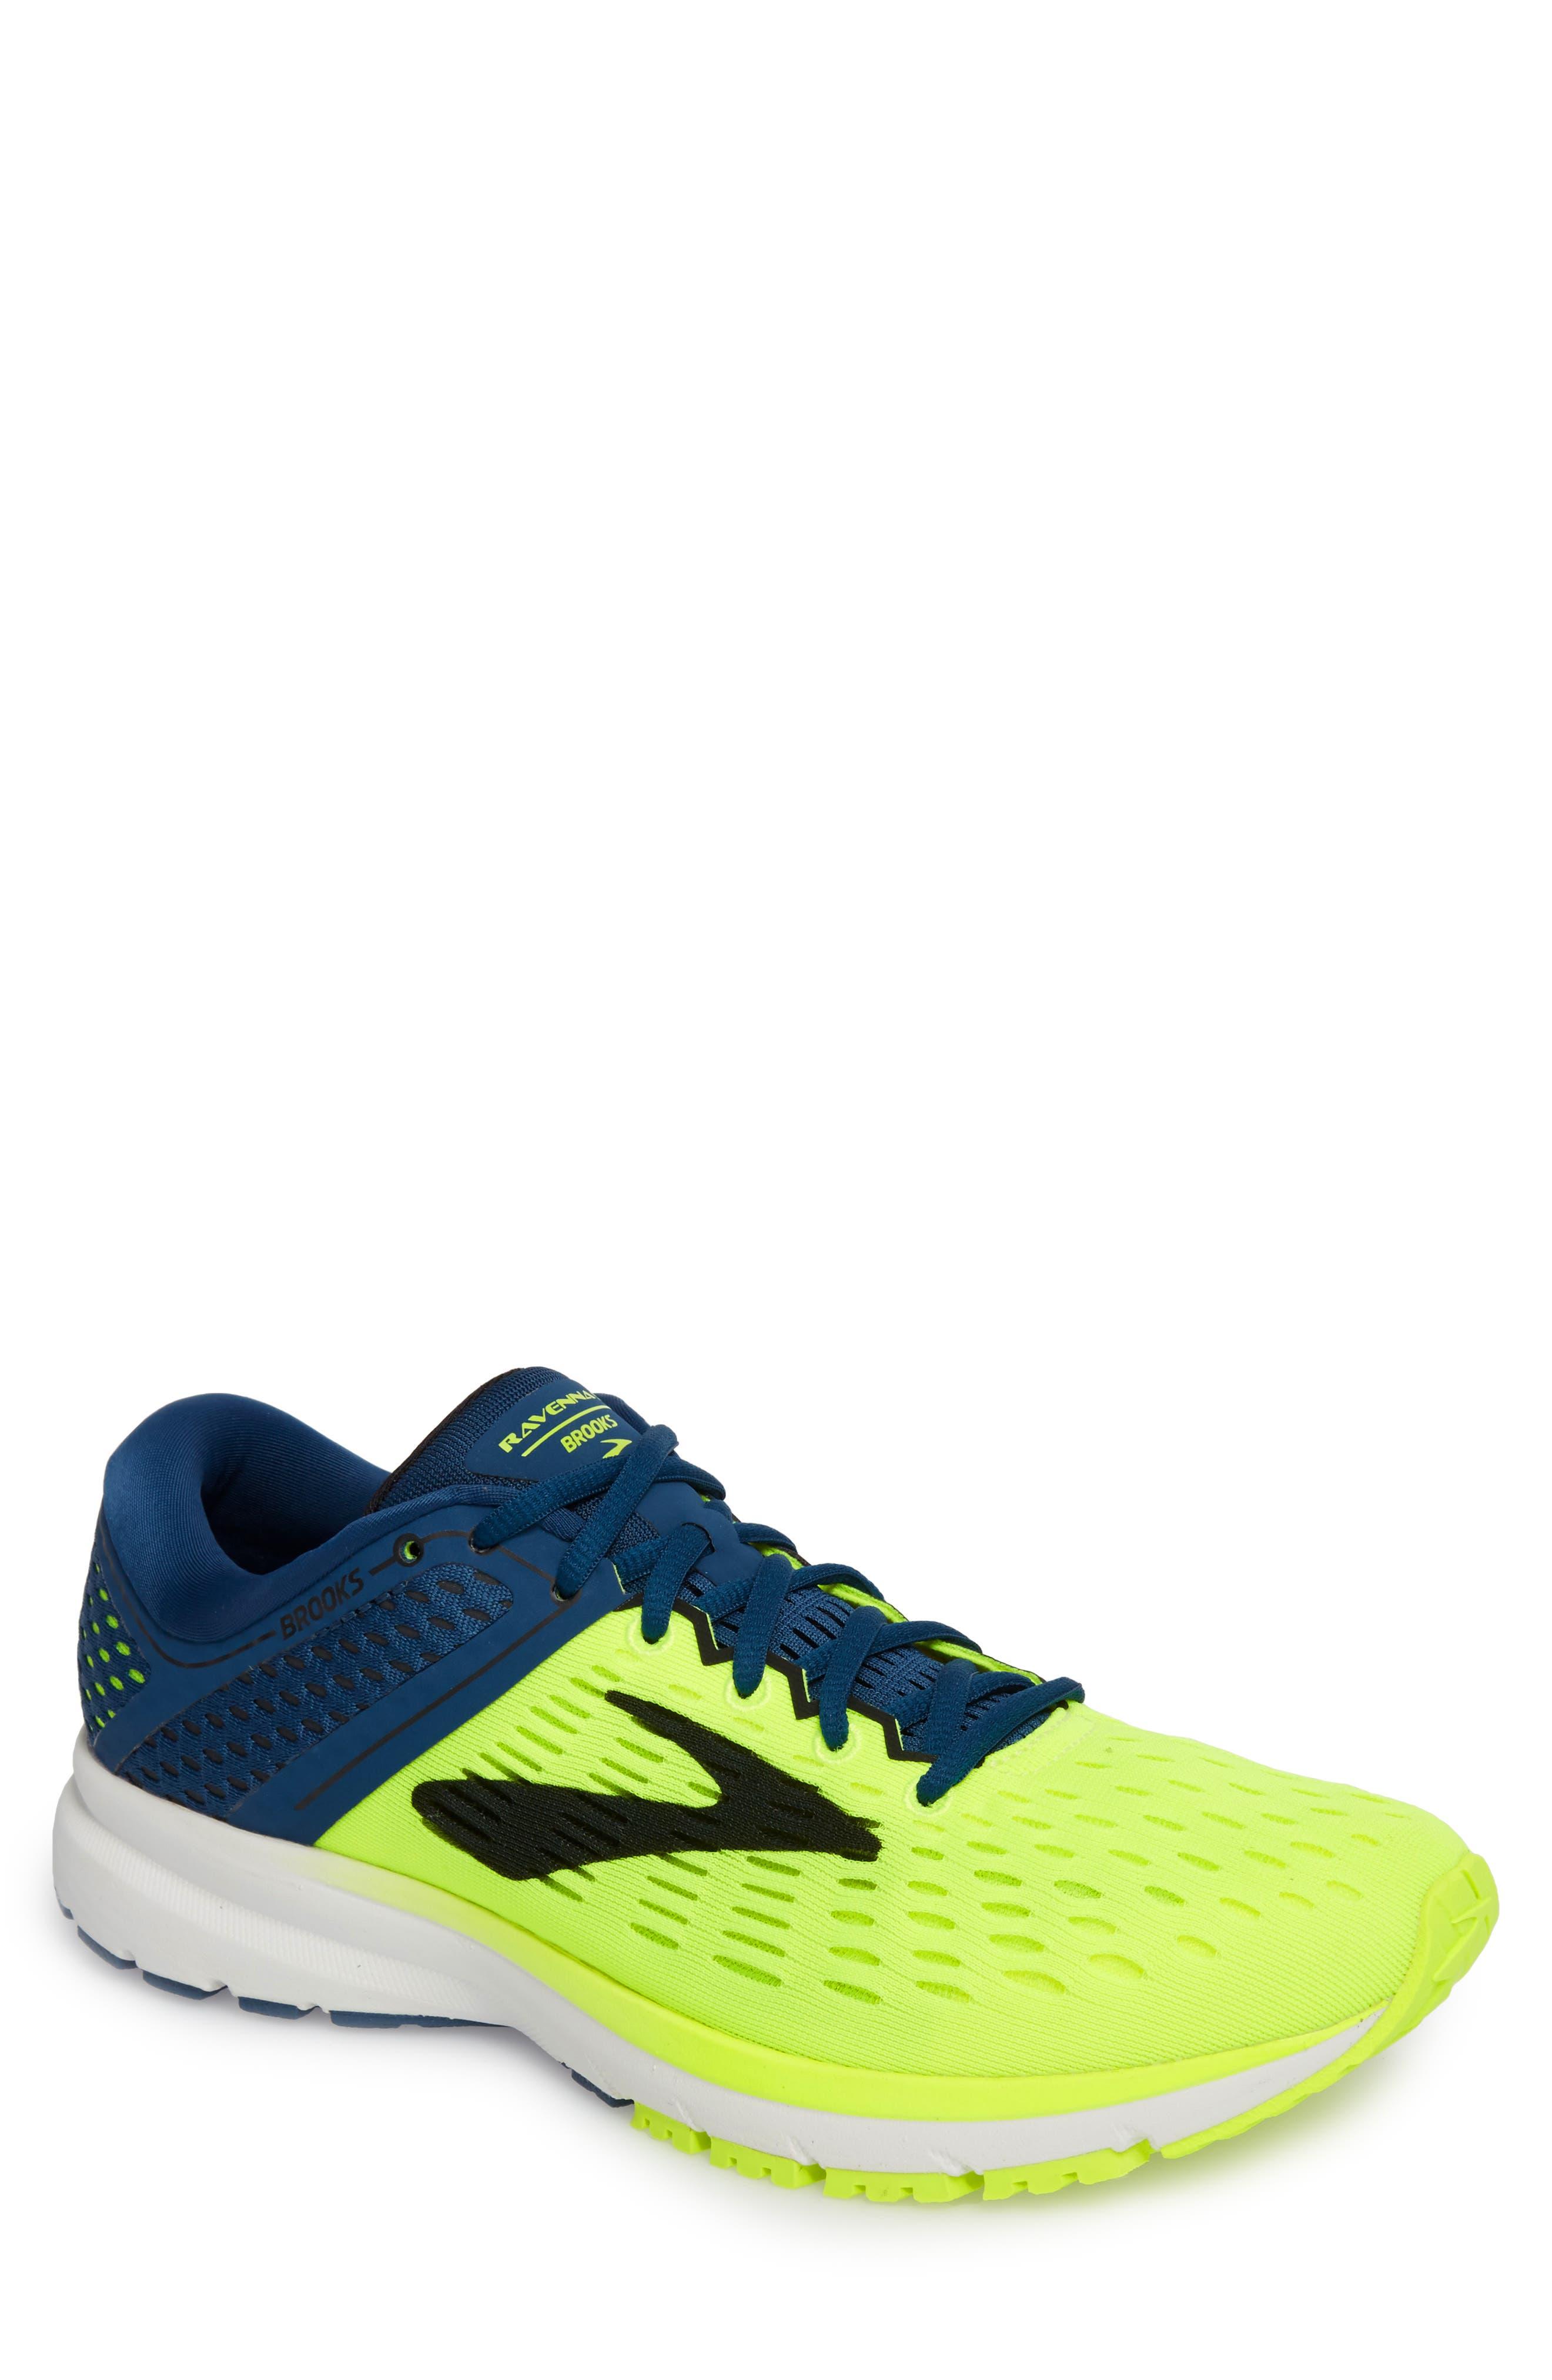 Ravenna 9 Running Shoe,                             Main thumbnail 1, color,                             Nightlife/ Blue/ Black